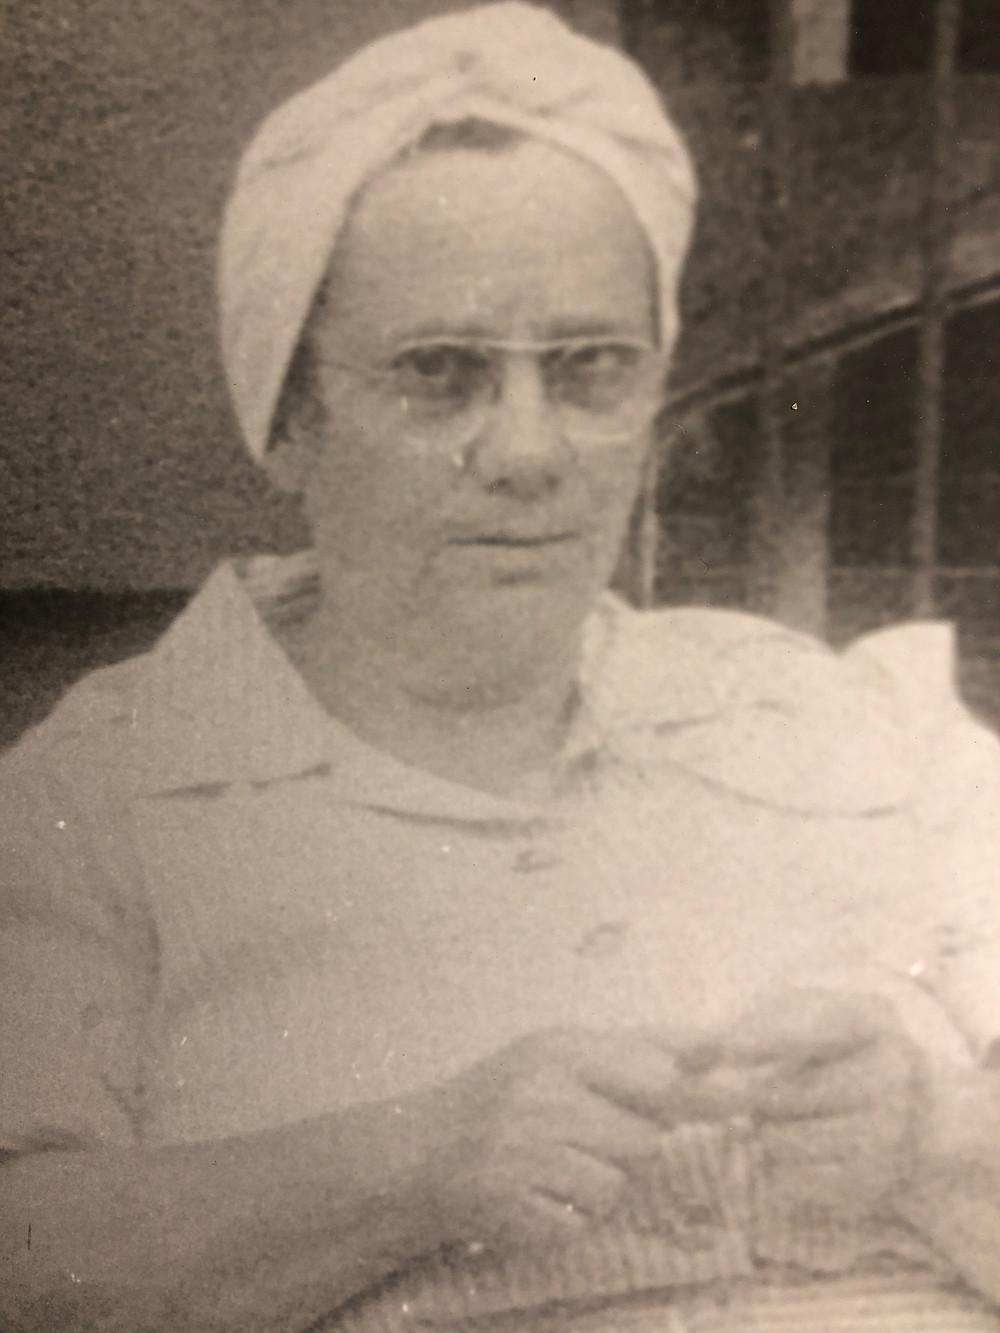 Photos of my maternal grandparents.